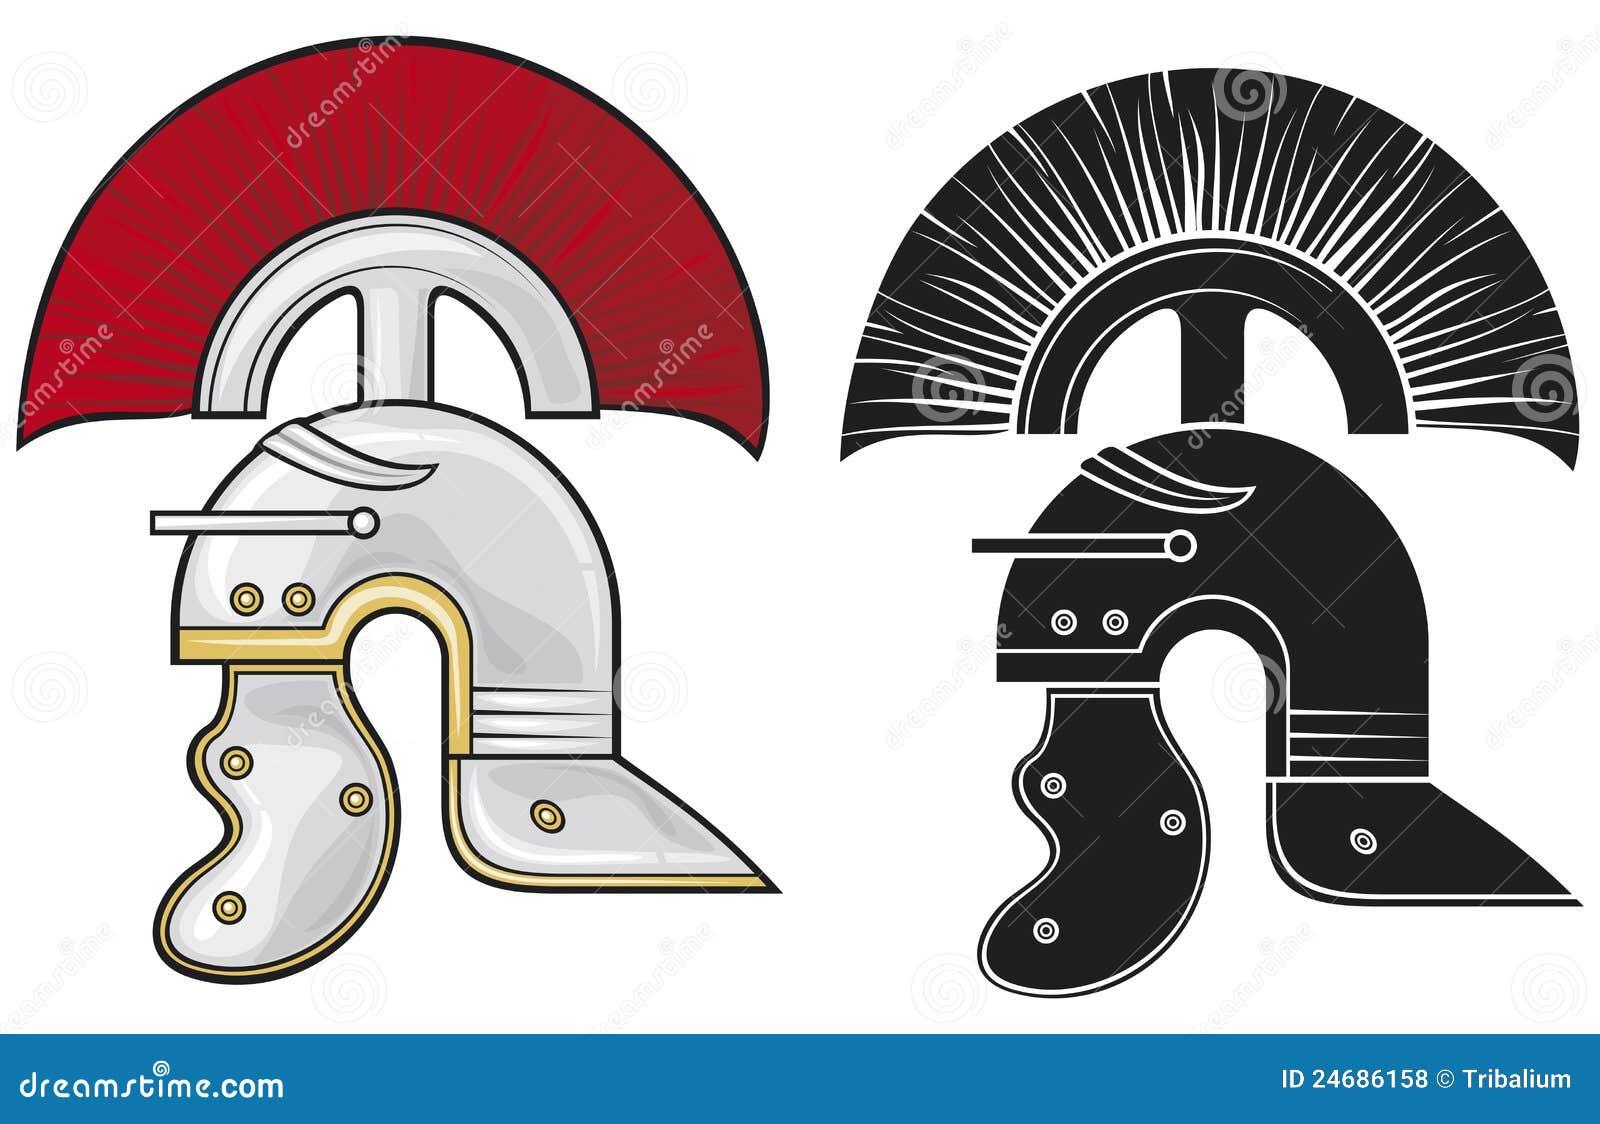 Black metal chair - Roman Helmet Royalty Free Stock Photos Image 24686158